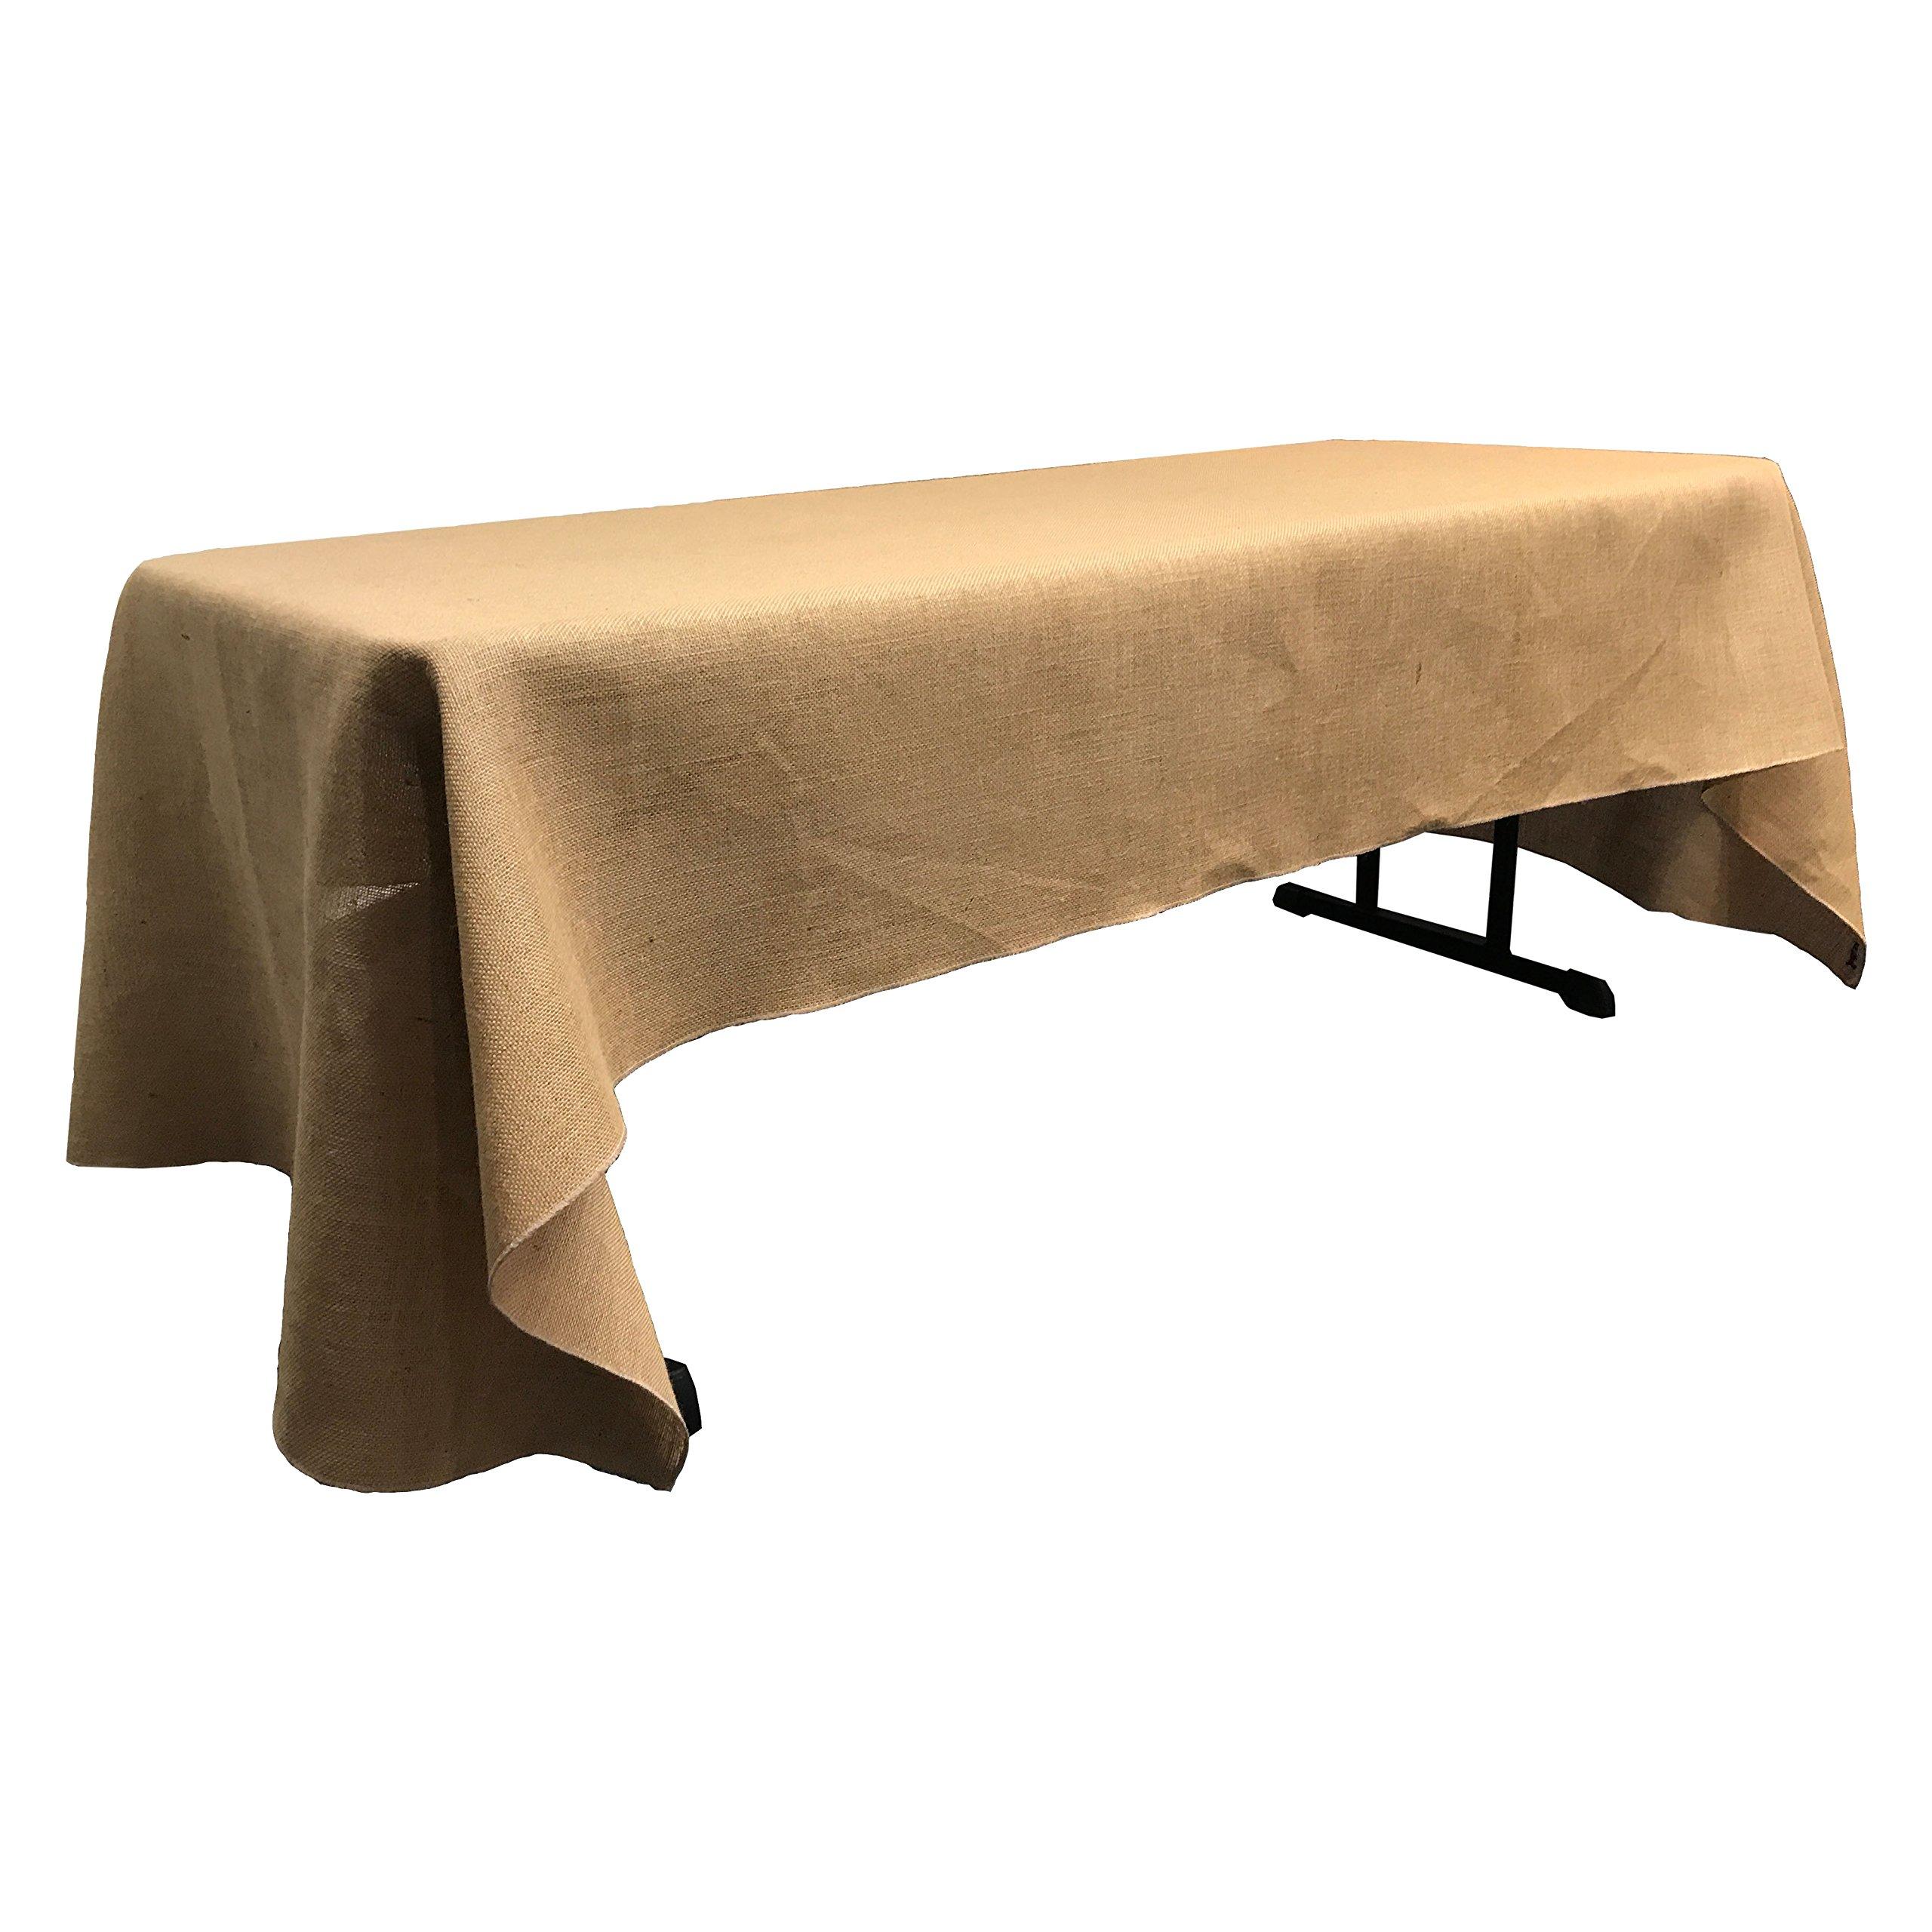 LA Linen 60'' by 126'' Rectangular Jute Burlap Tablecloth/Pack of 1/Natural.